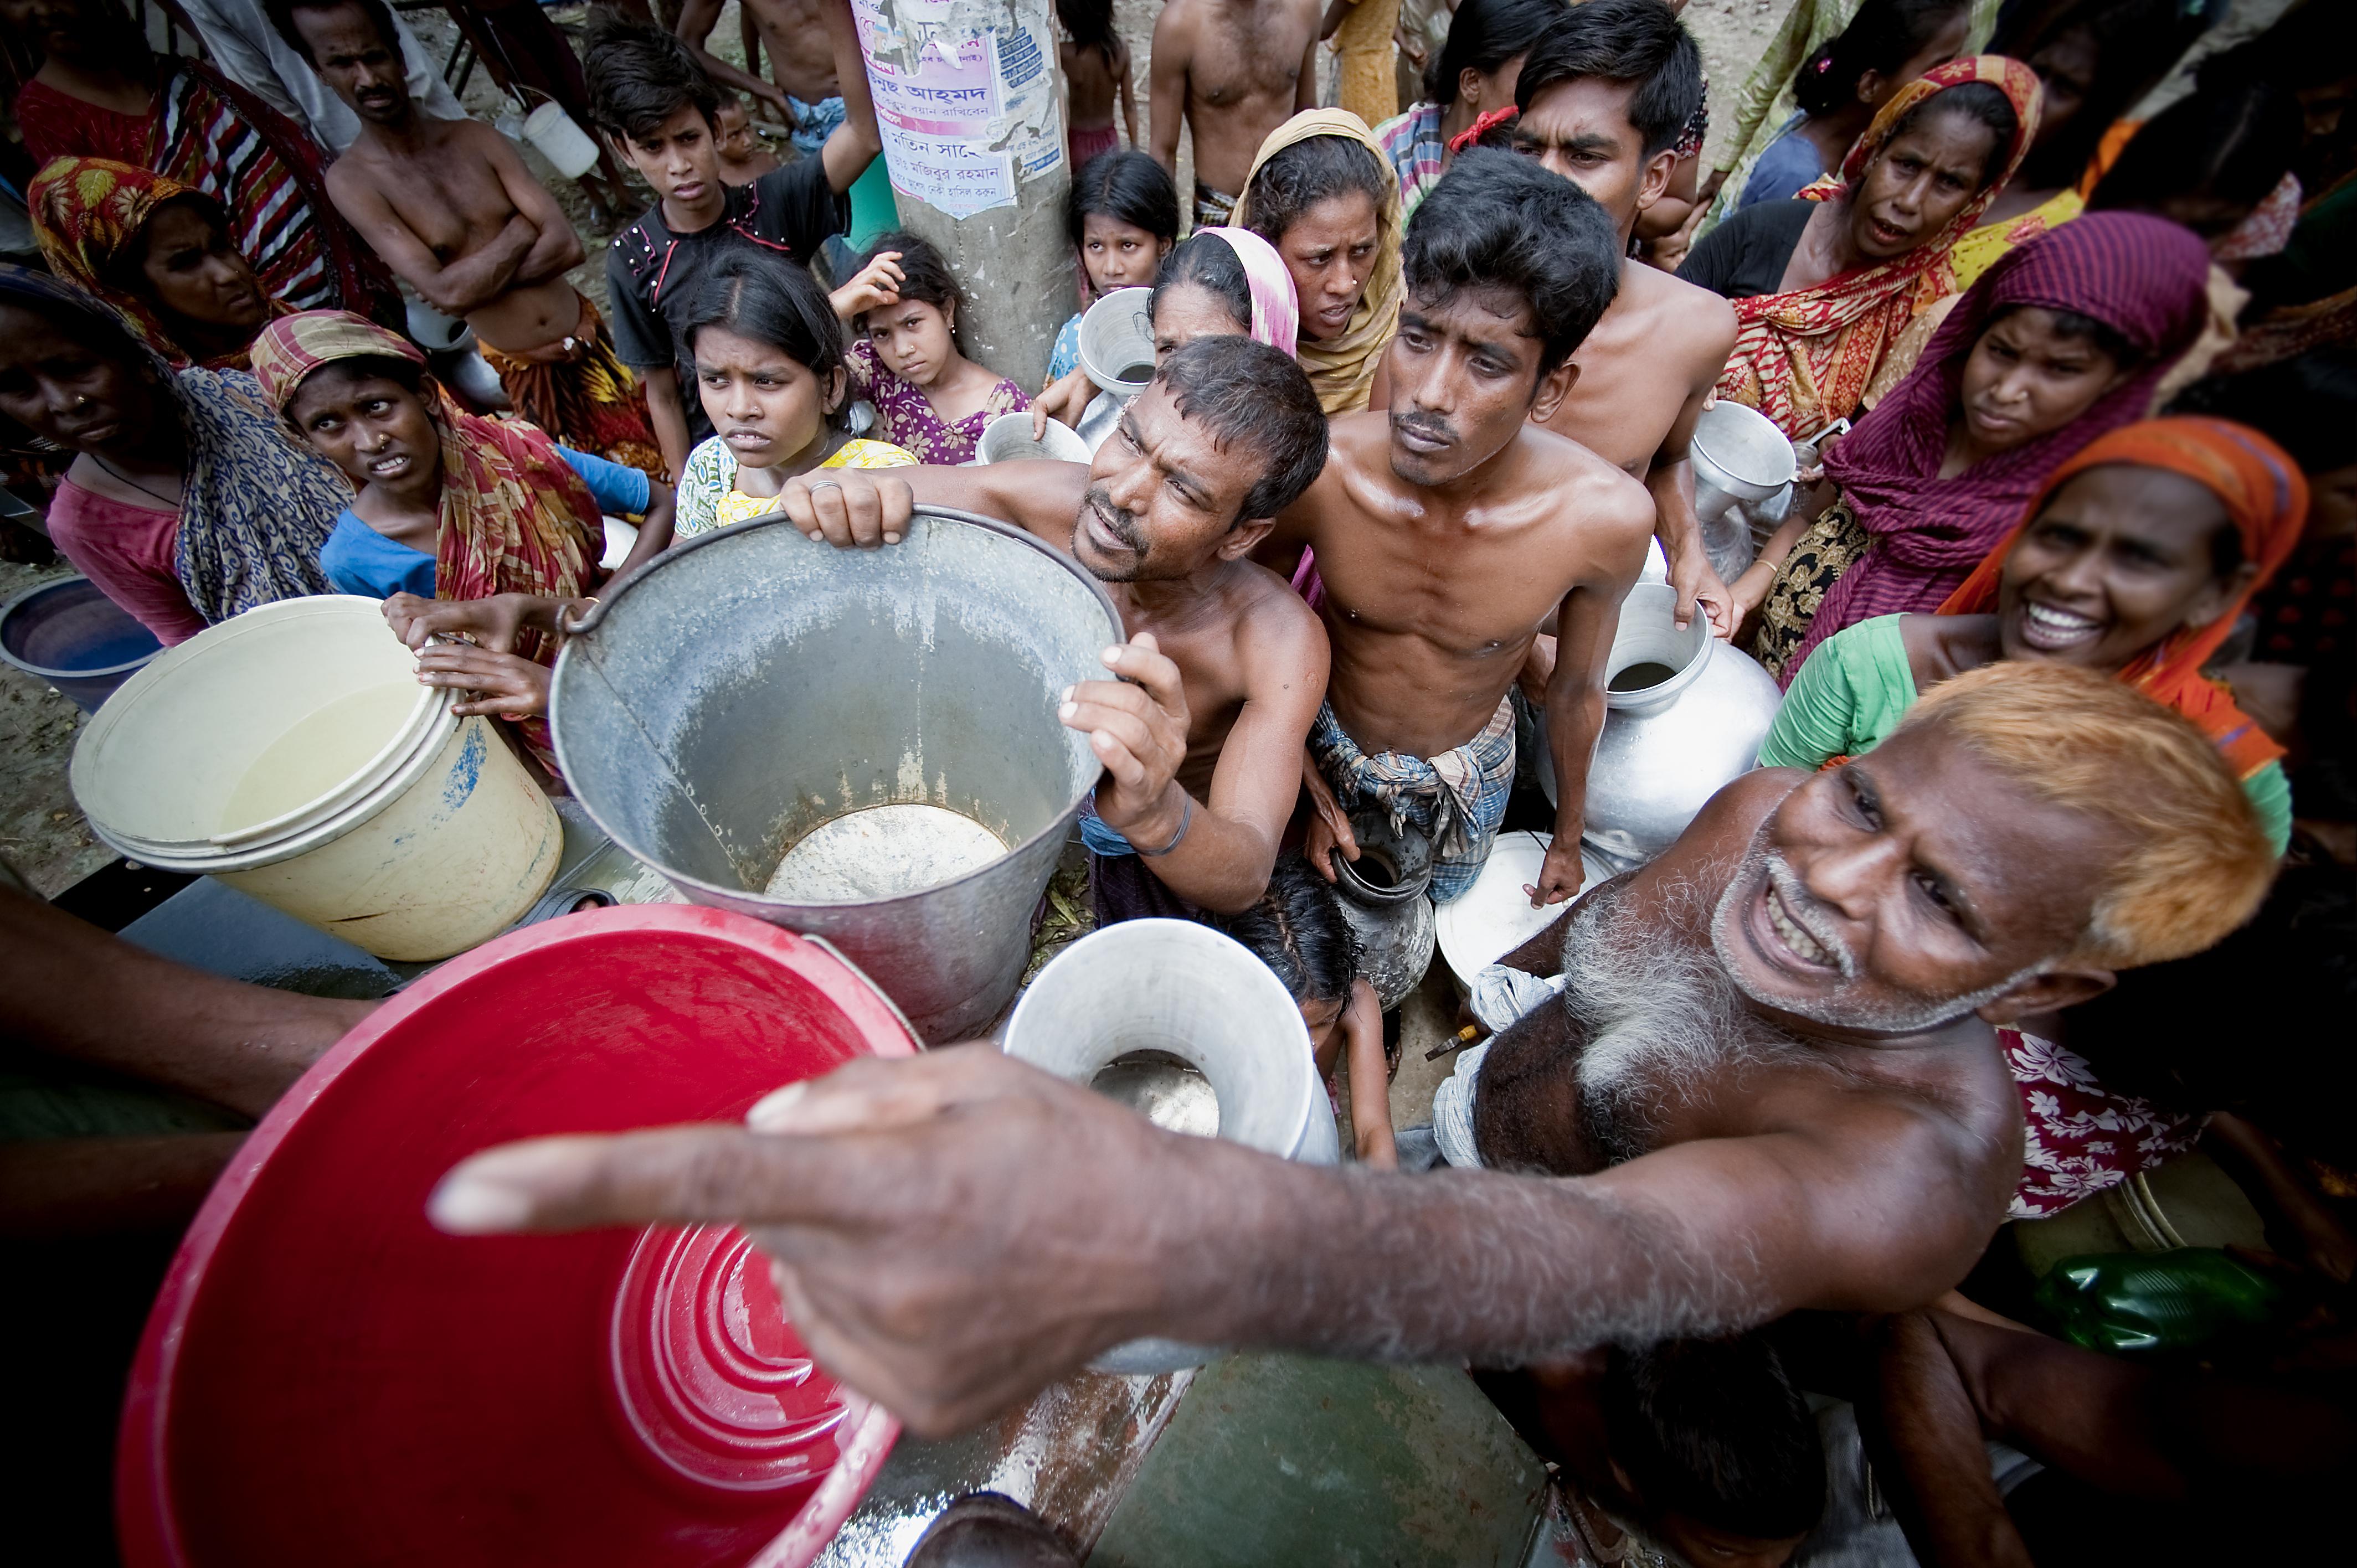 11 June 2010- Dhaka, Bangladesh - Water-military-Old Dhaka-Photo Credit :Kibae Park/Sipa Press sdg 6 water